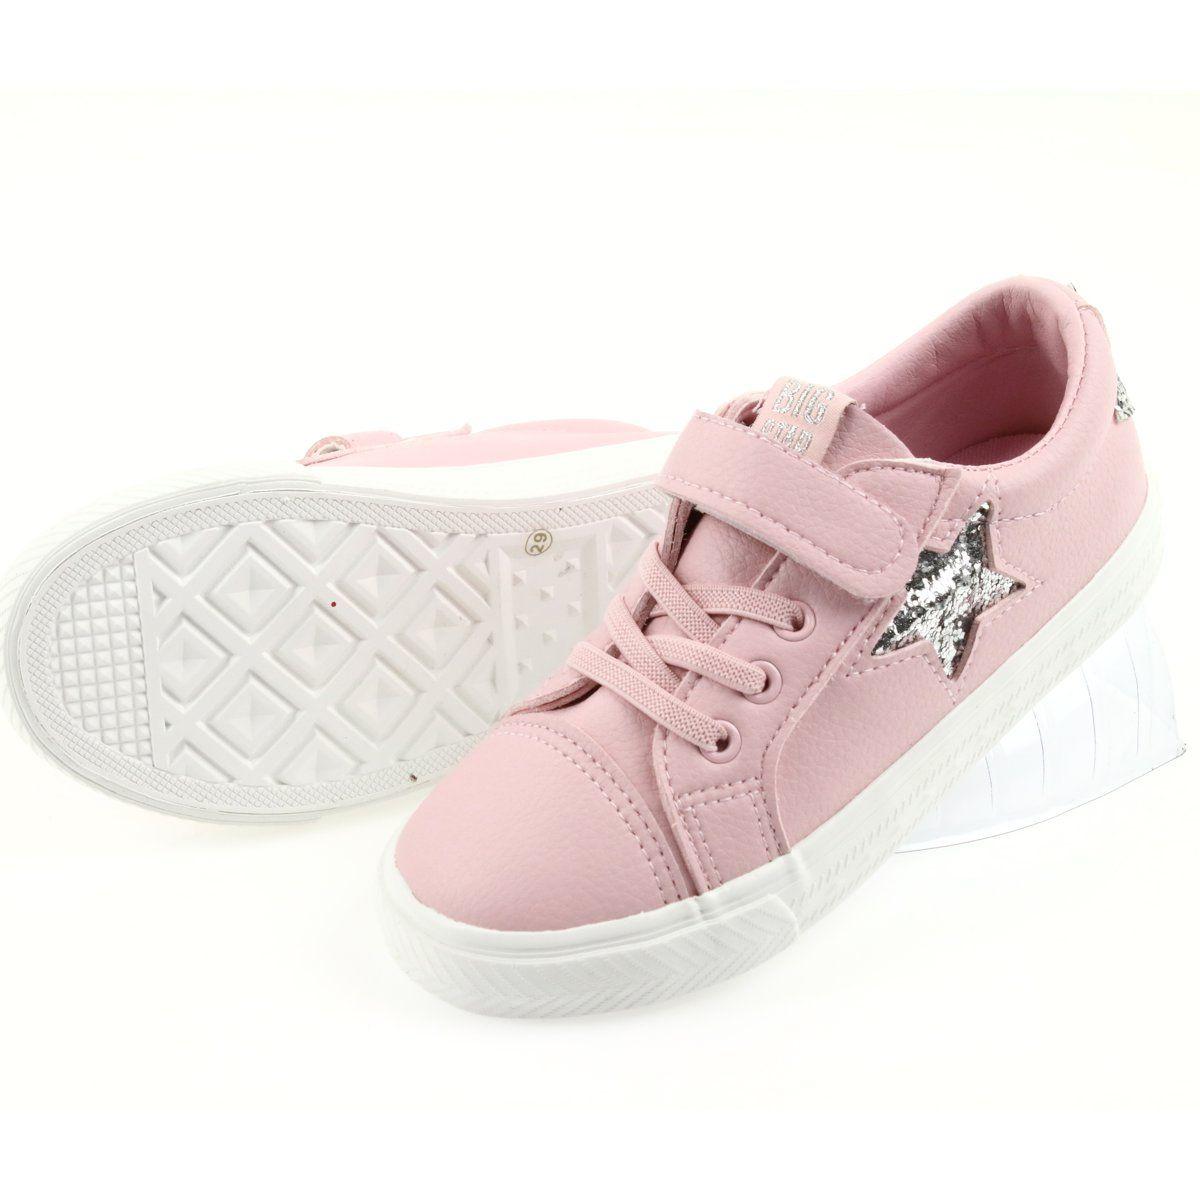 Big Star Trampki Na Rzepy Gwiazda 374104 Rozowe Szare Velcro Sneakers Childrens Sneakers Sneakers